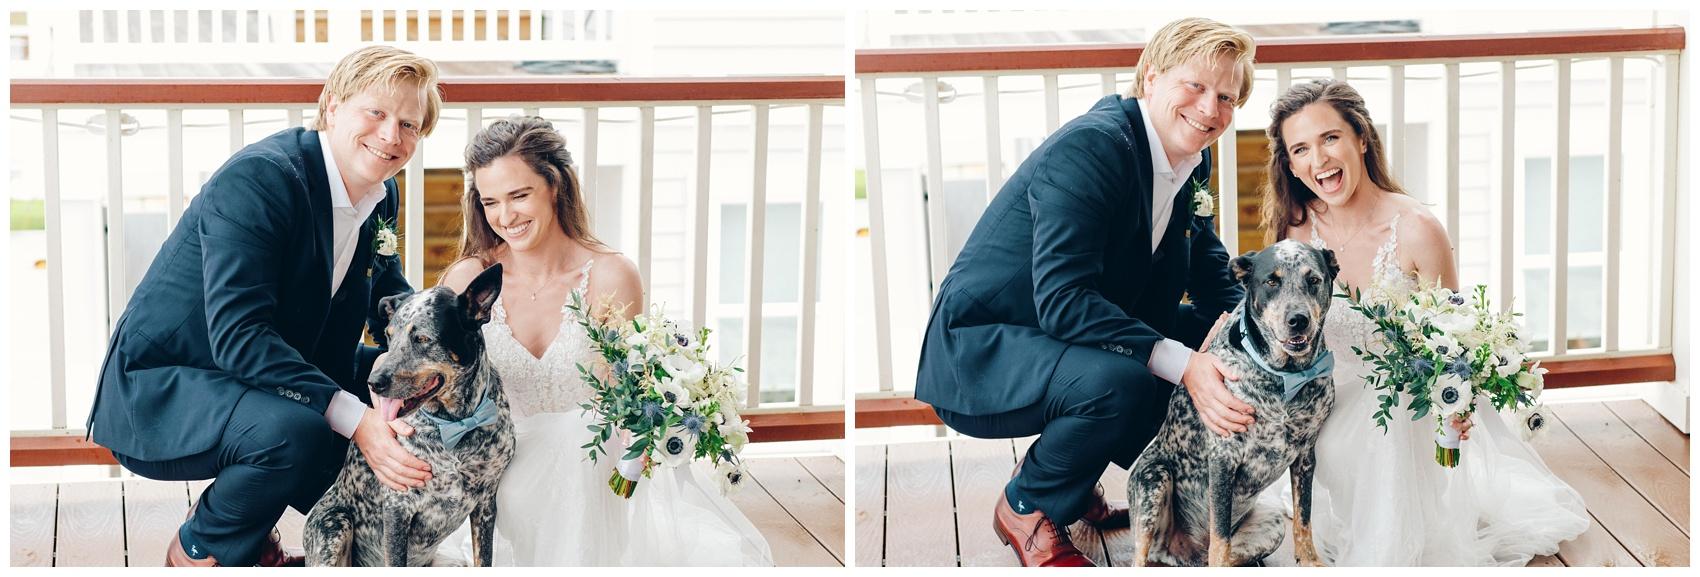 Outer-Banks-Corolla-Wedding_0136.jpg